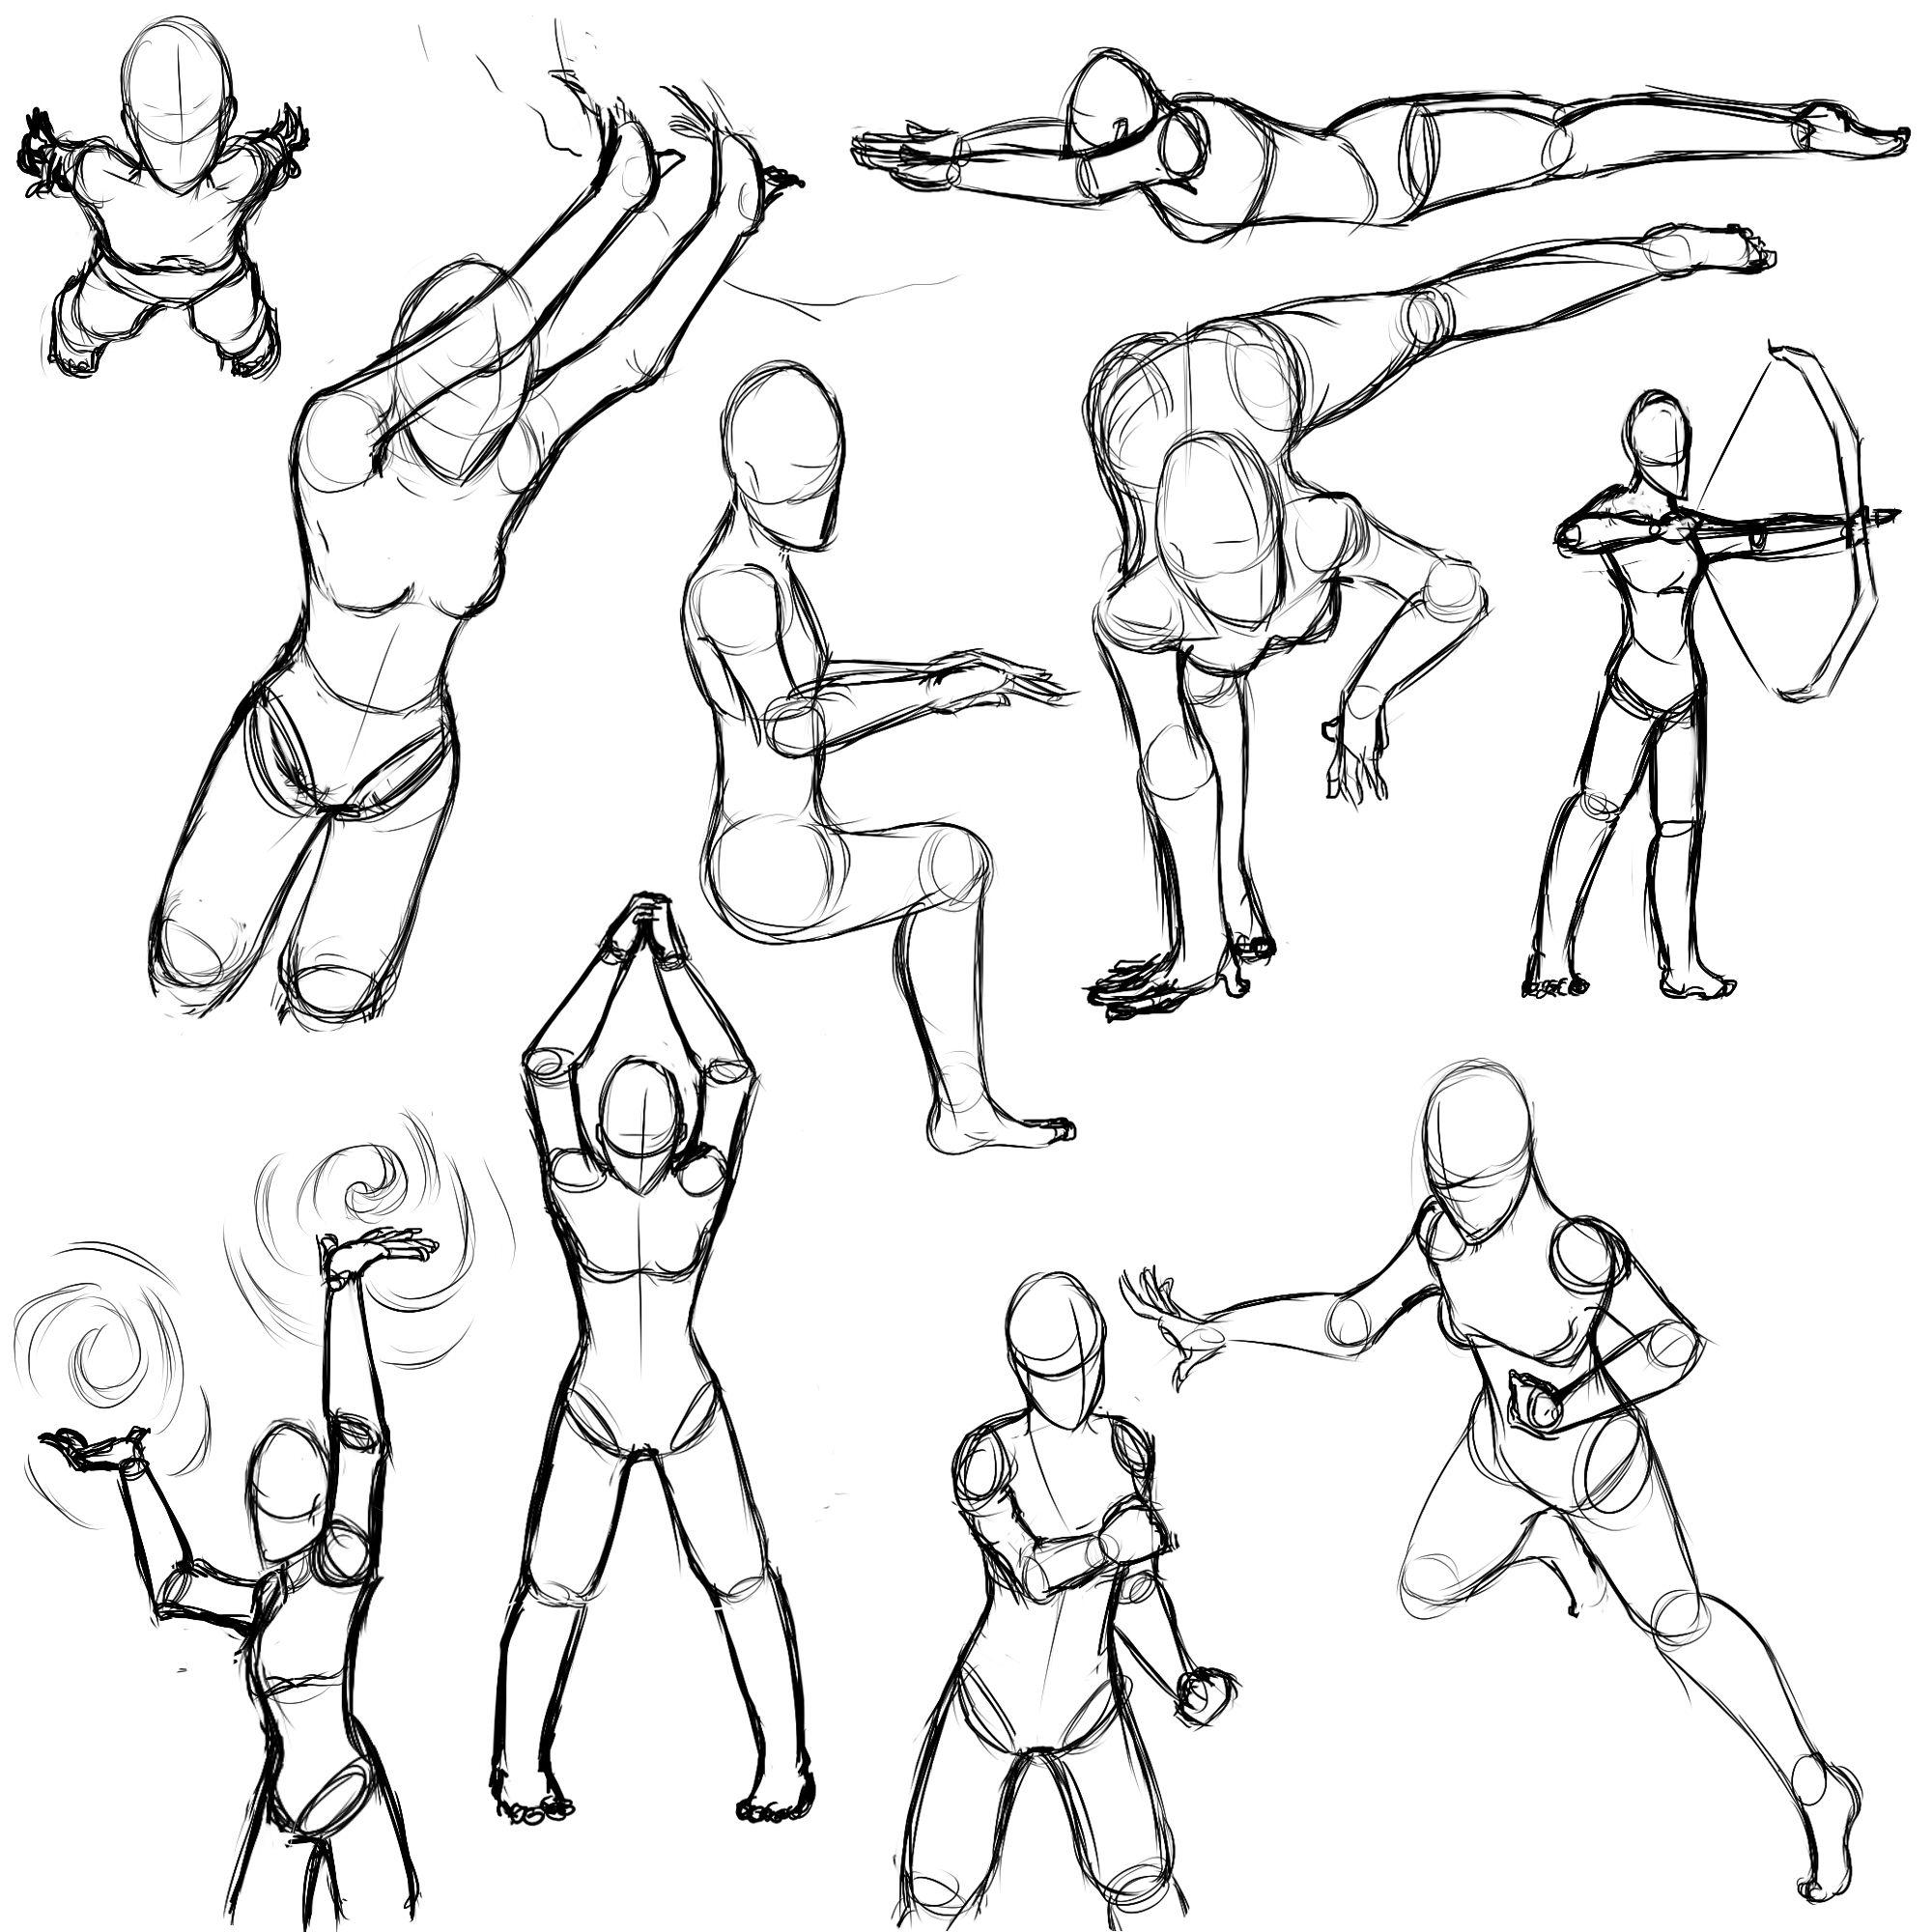 Female Action Poses by Sefti.deviantart.com on @deviantART | Draw ...